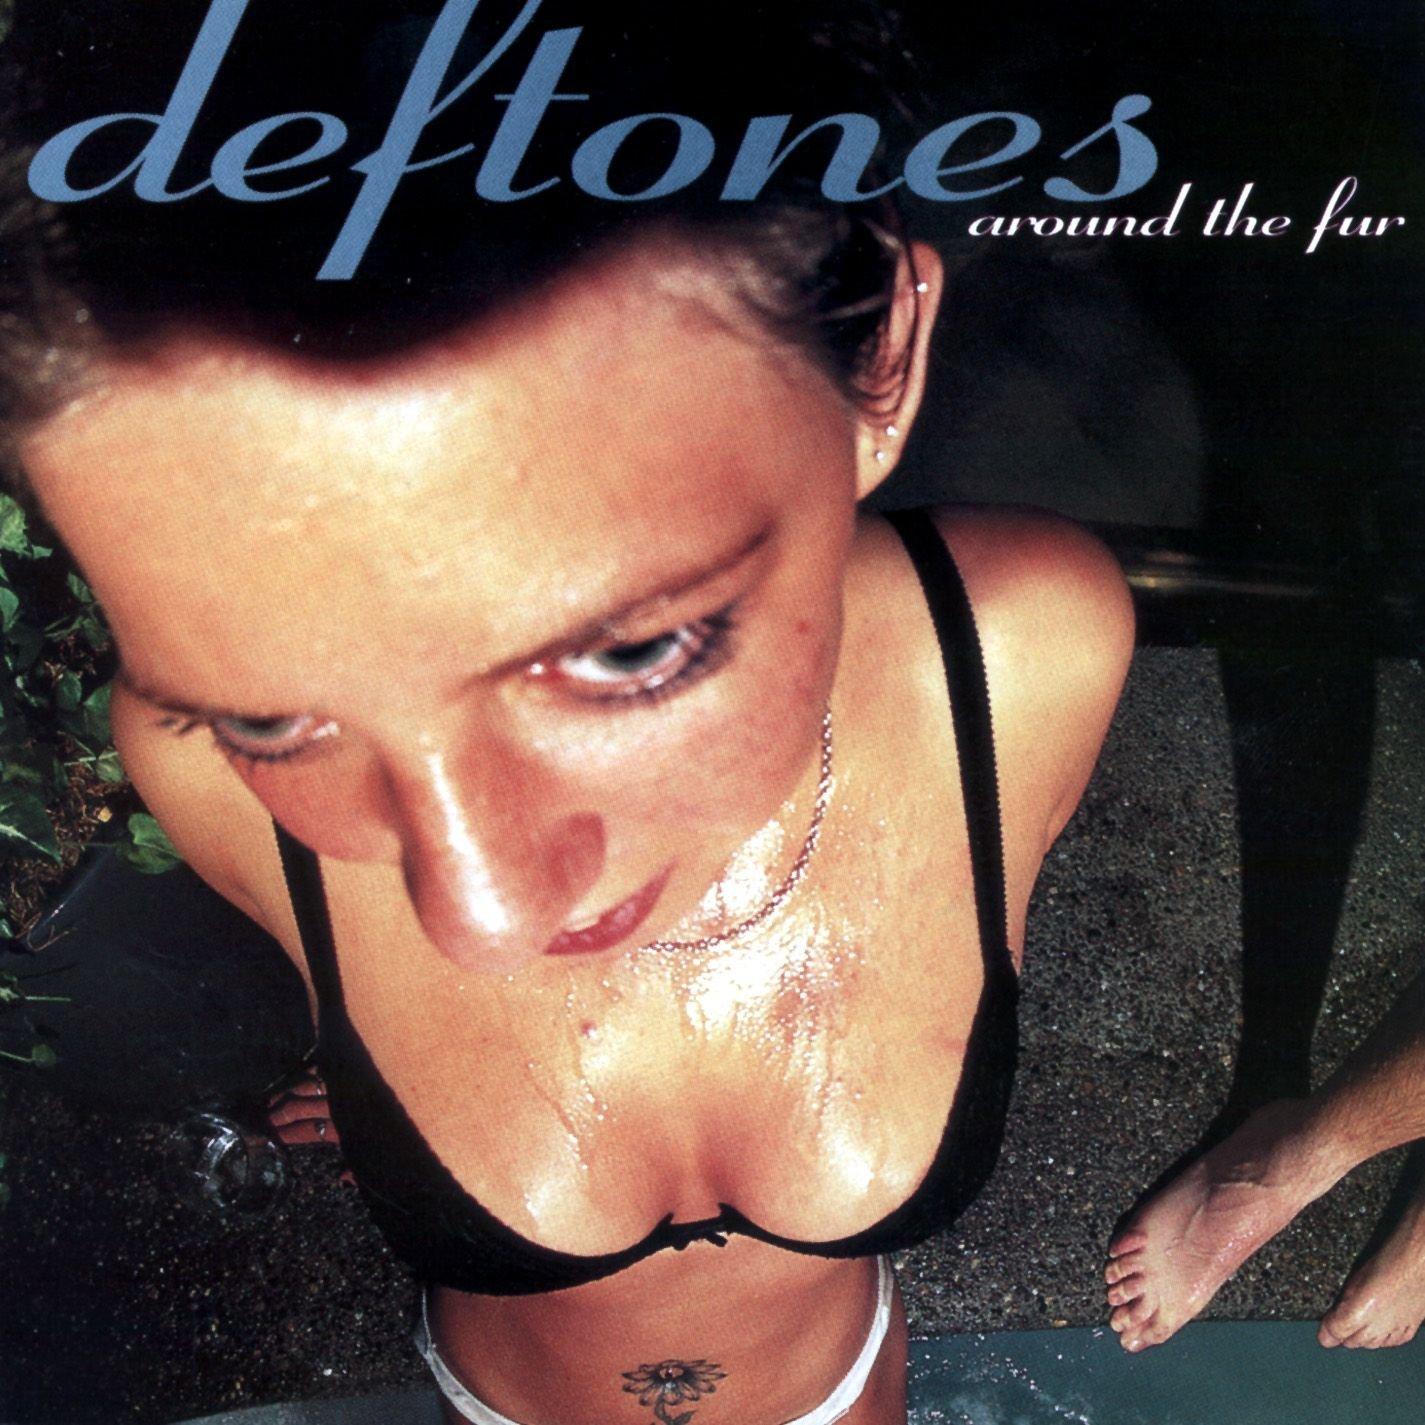 DEFTONES - AROUND THE FUR (MAVERICK RECORDS, 1997)